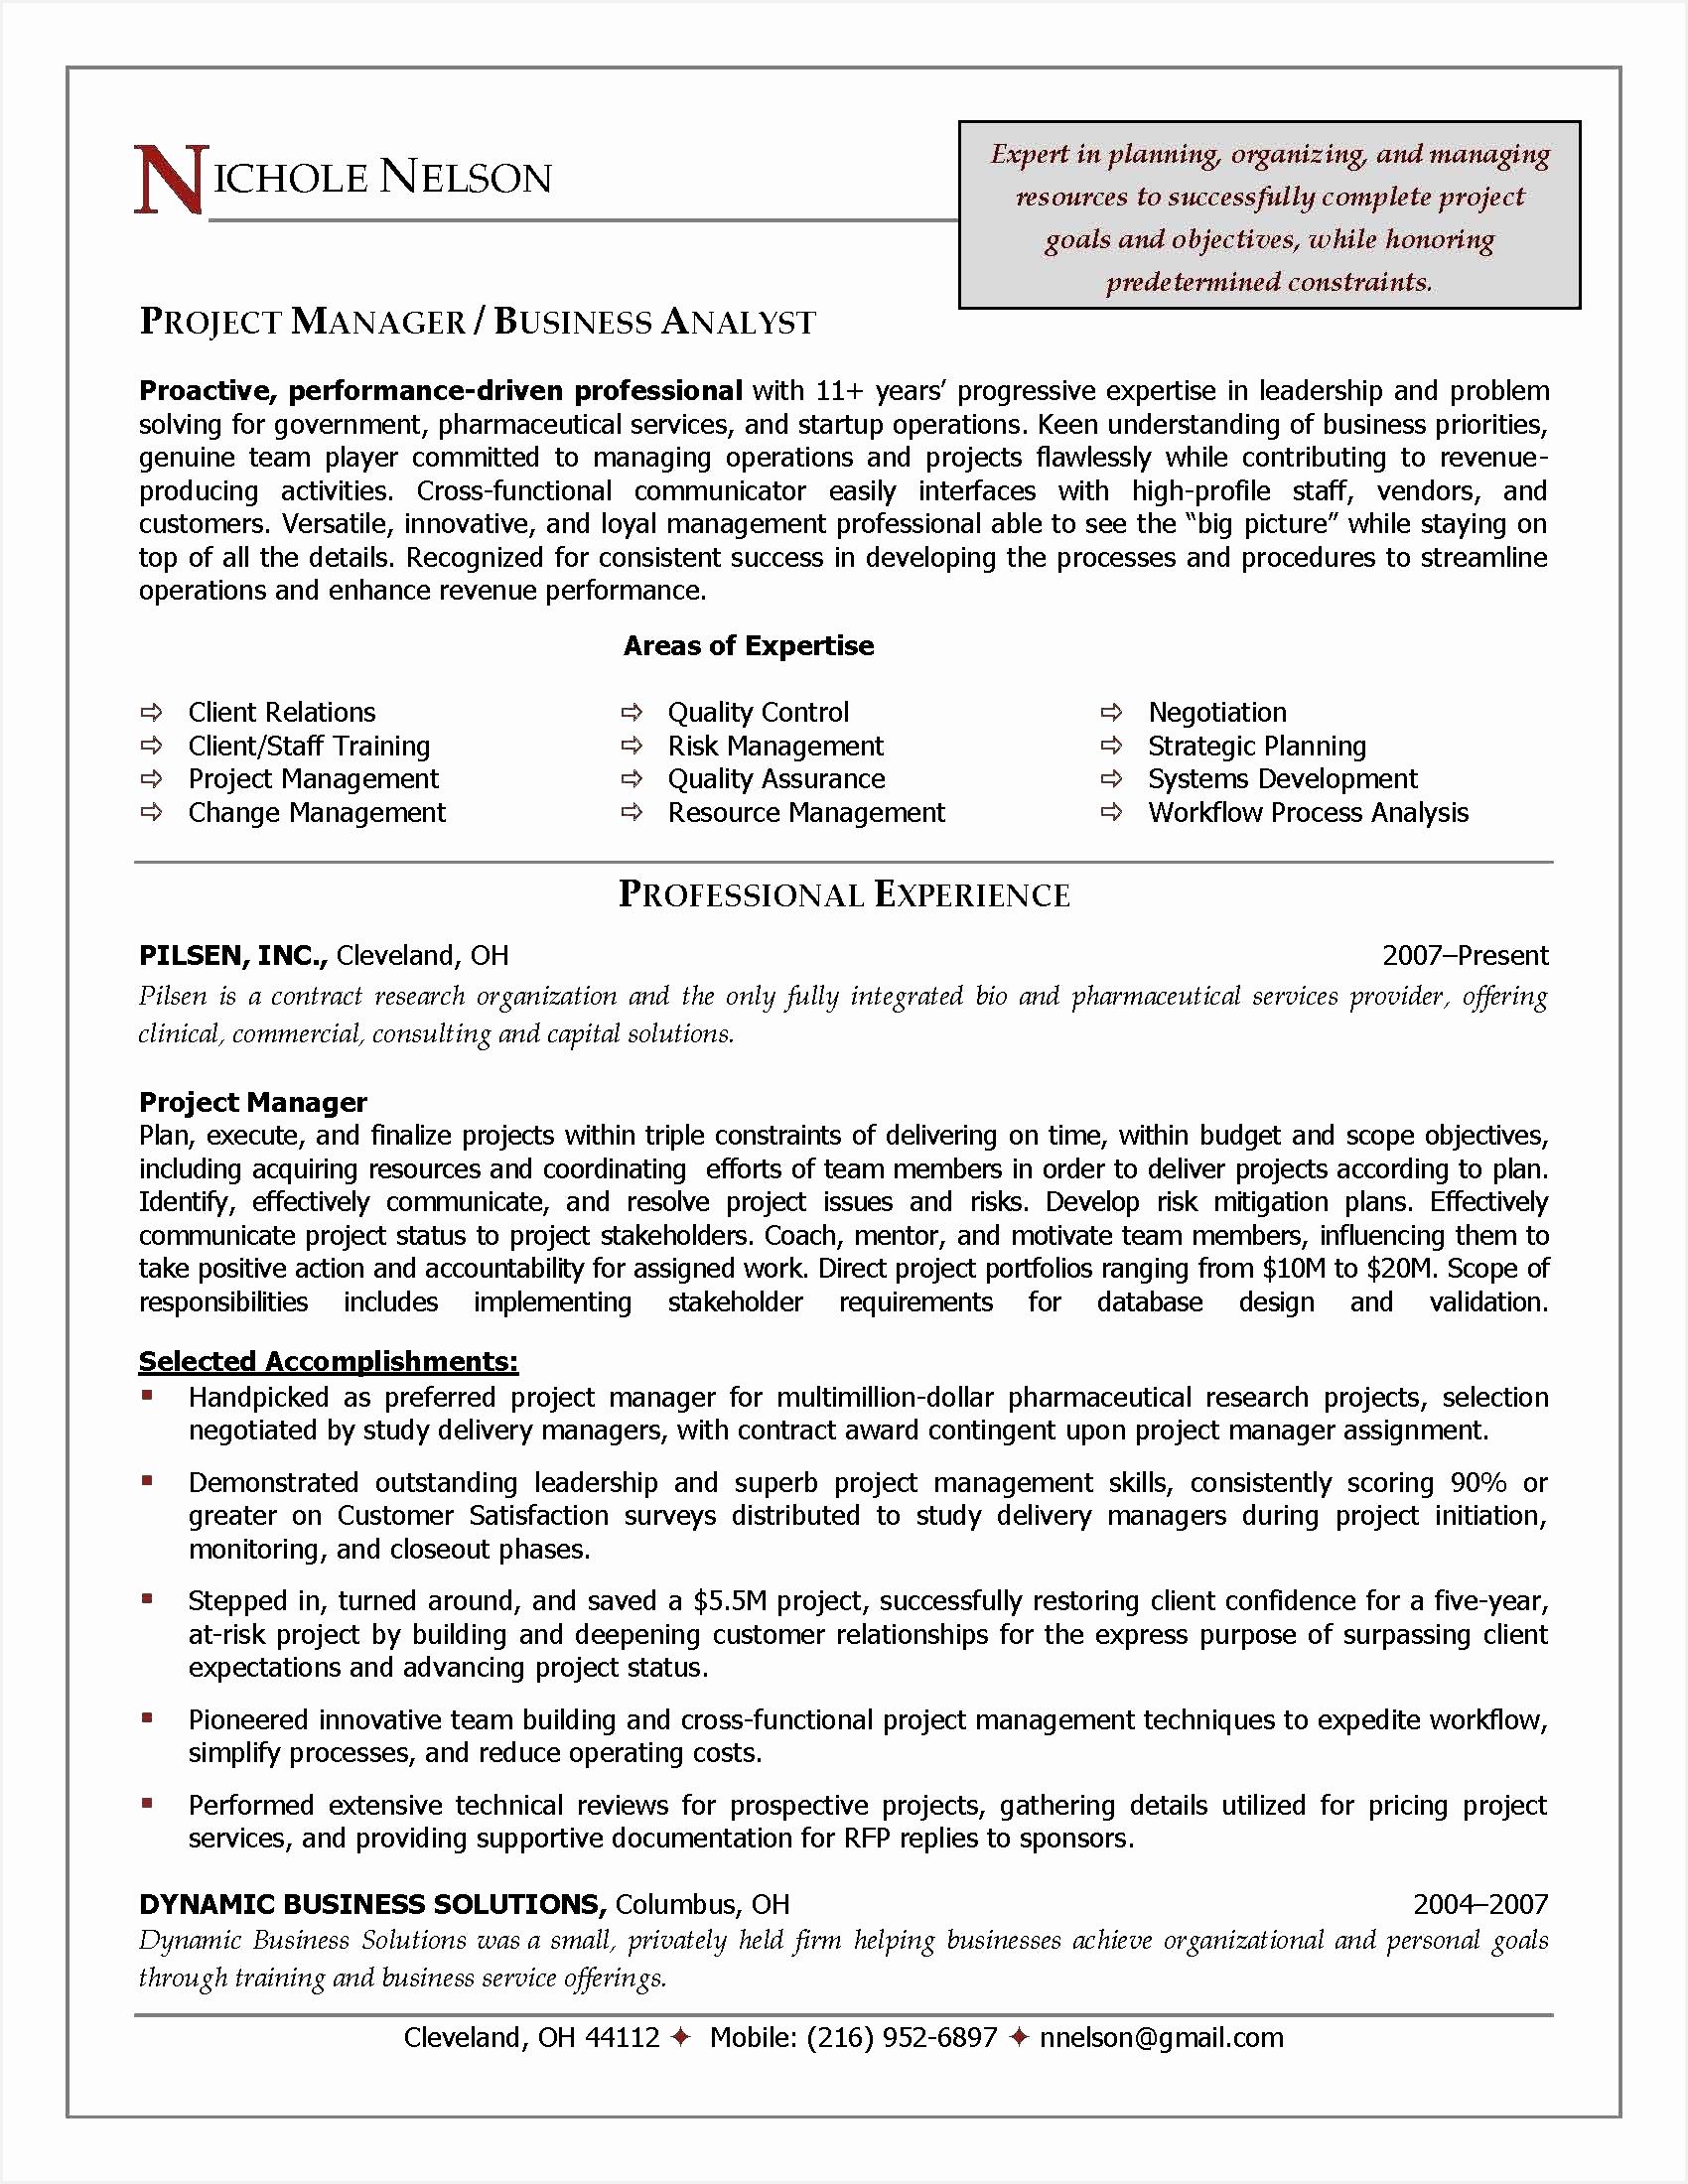 Blank Resume Template Pdf Fresh Resume Examples Pdf Best Resume Pdf 0d Blank Resume Template22001700